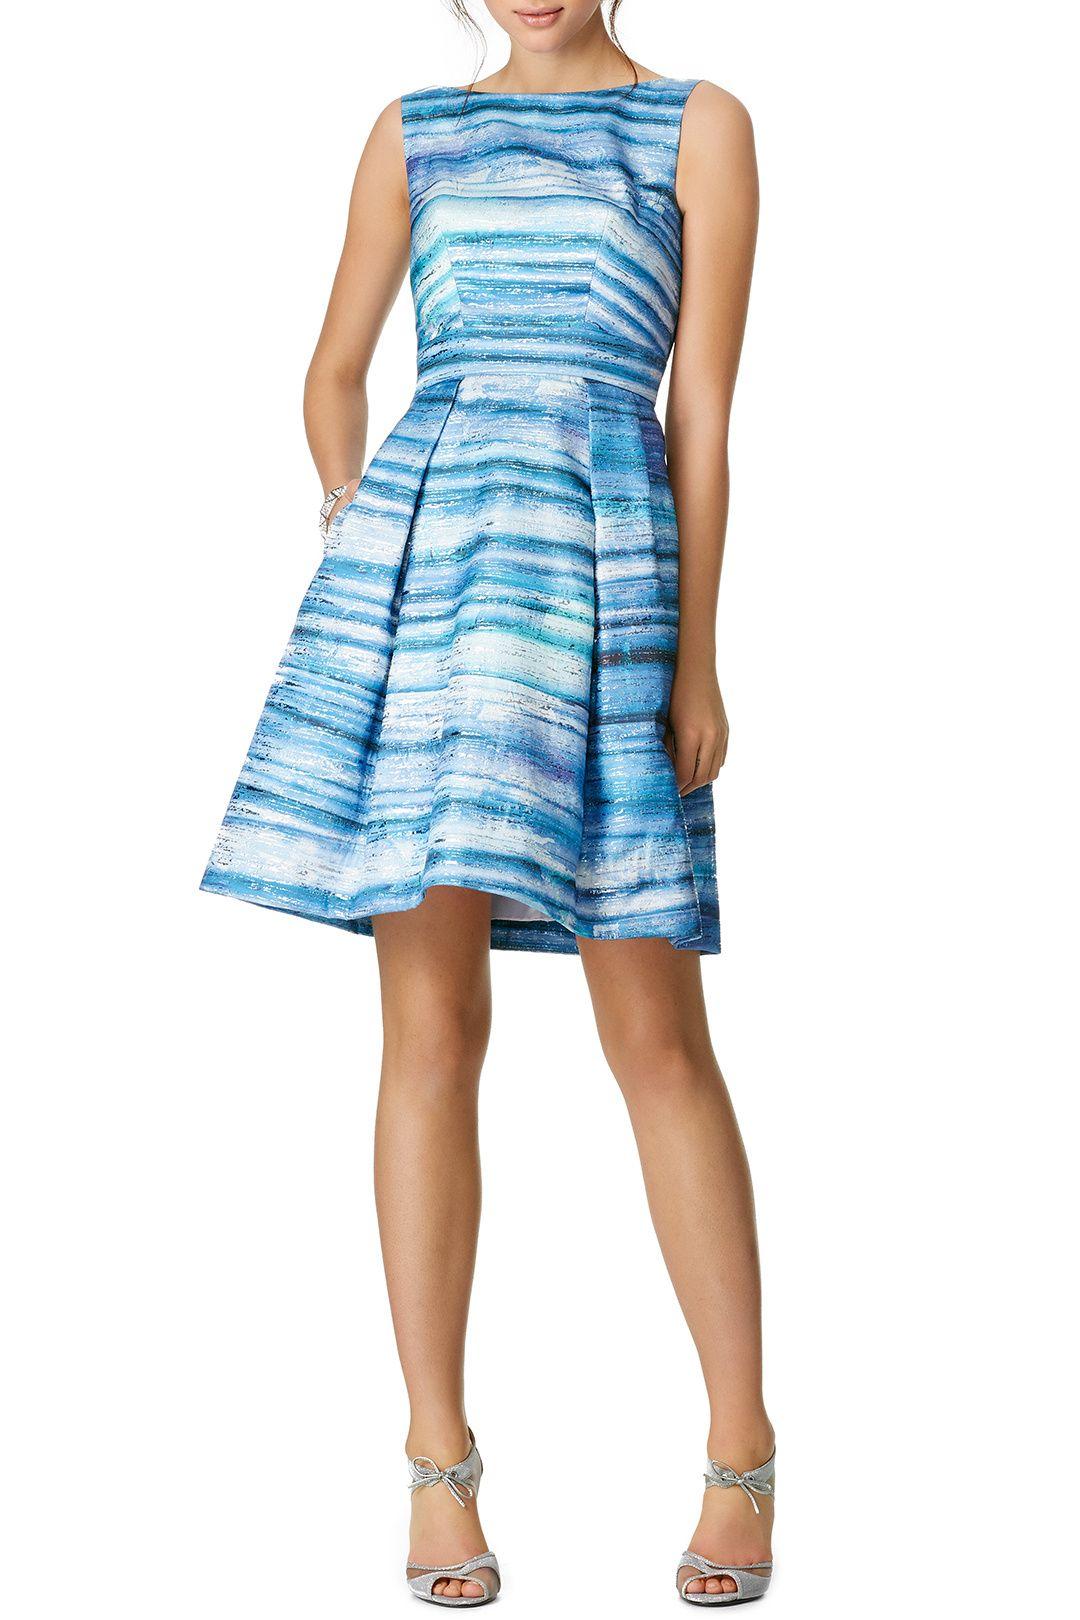 Blue Gradient Dress Dresses, Theia dresses, Nice dresses